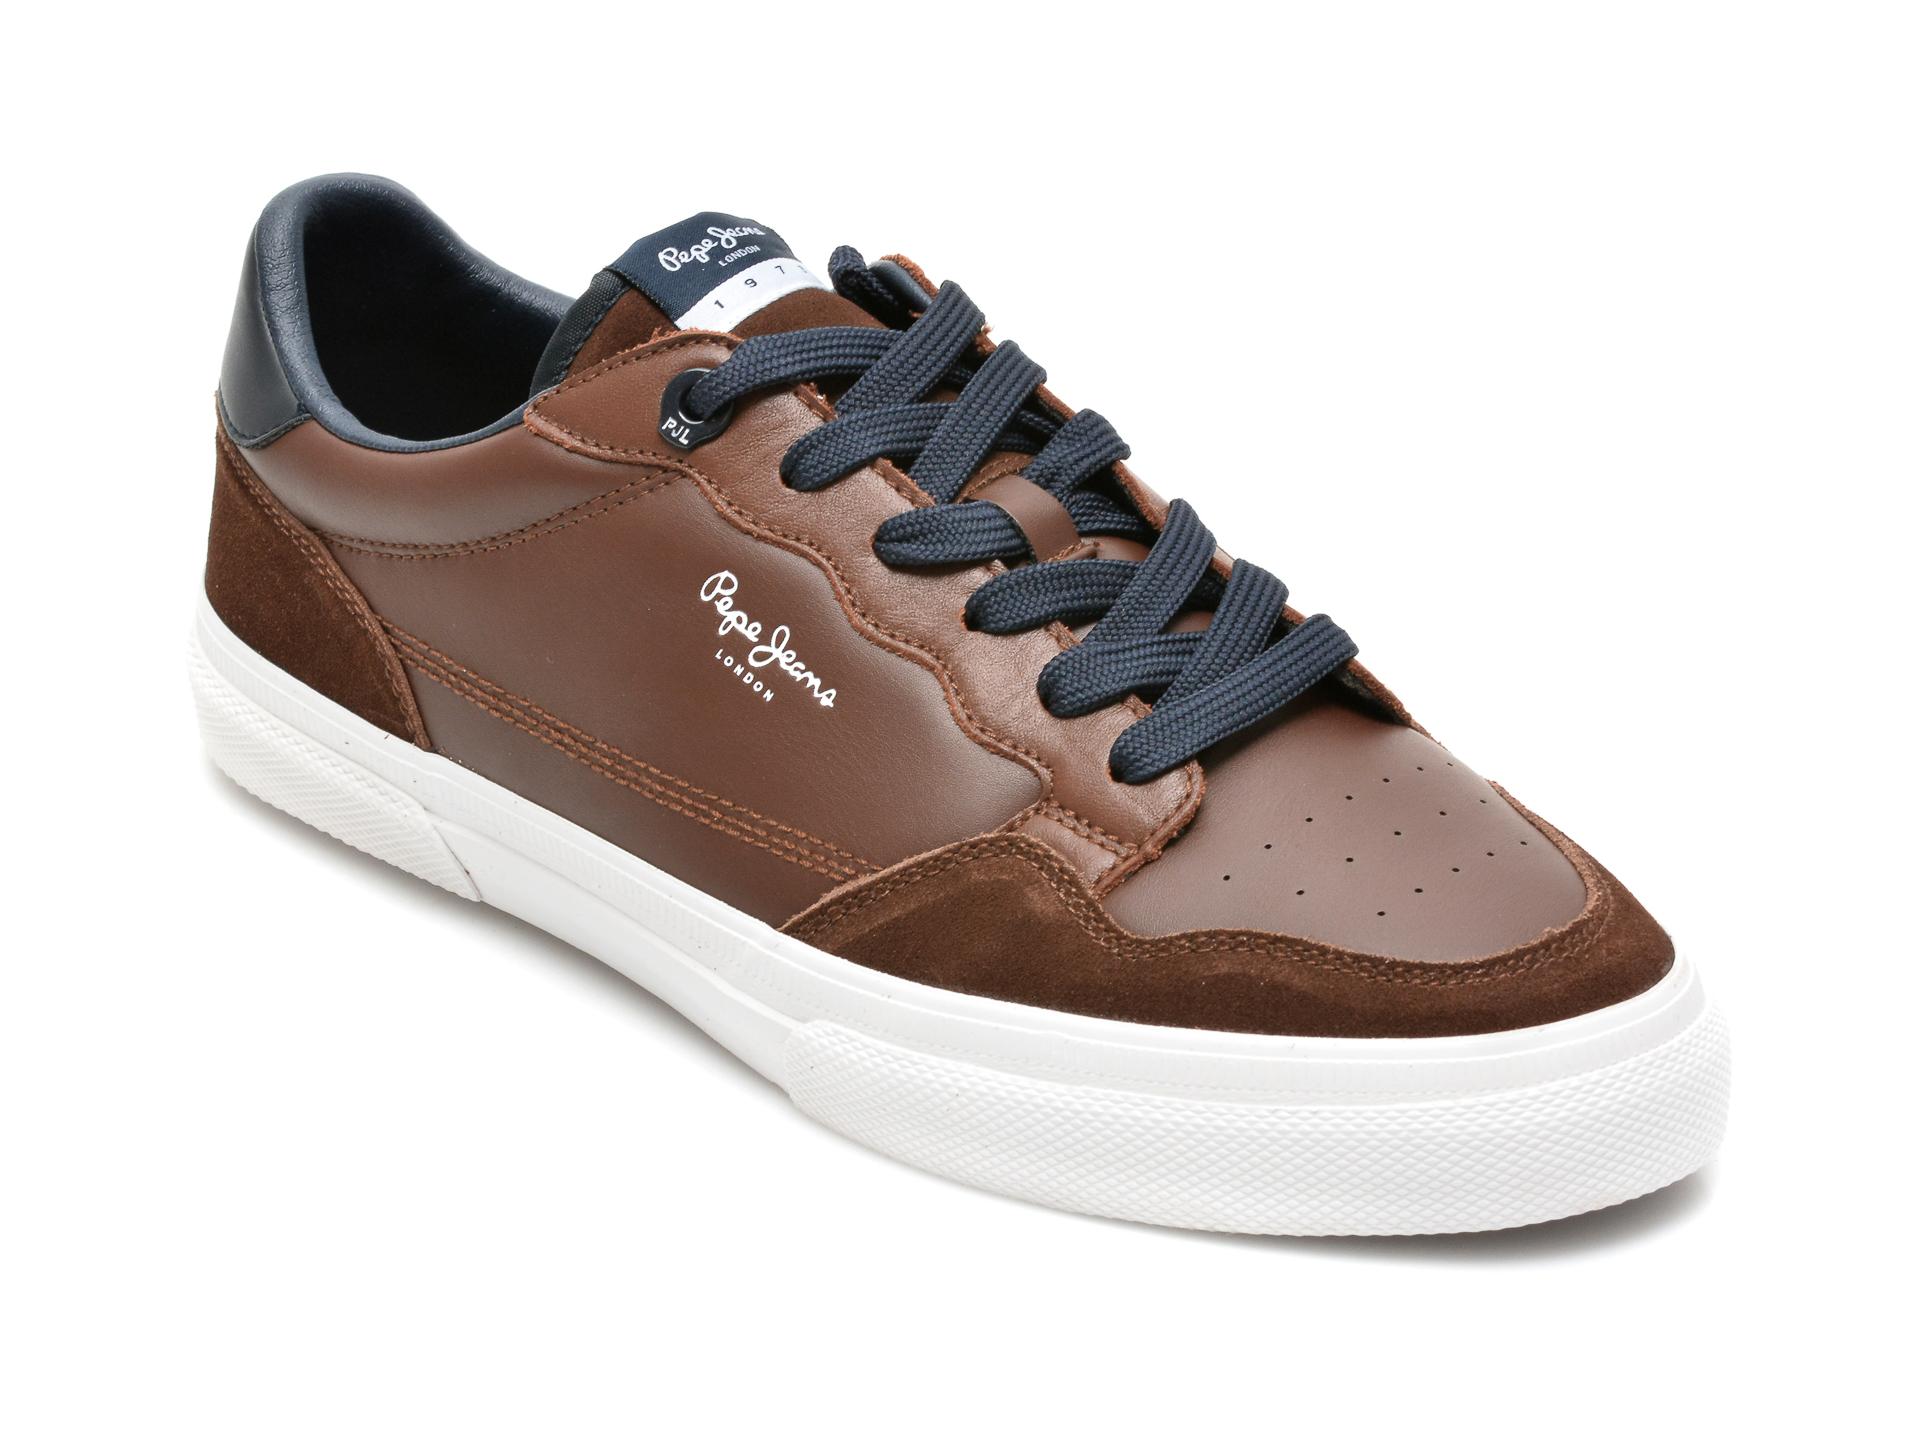 Pantofi sport PEPE JEANS maro, MS30765, din piele naturala